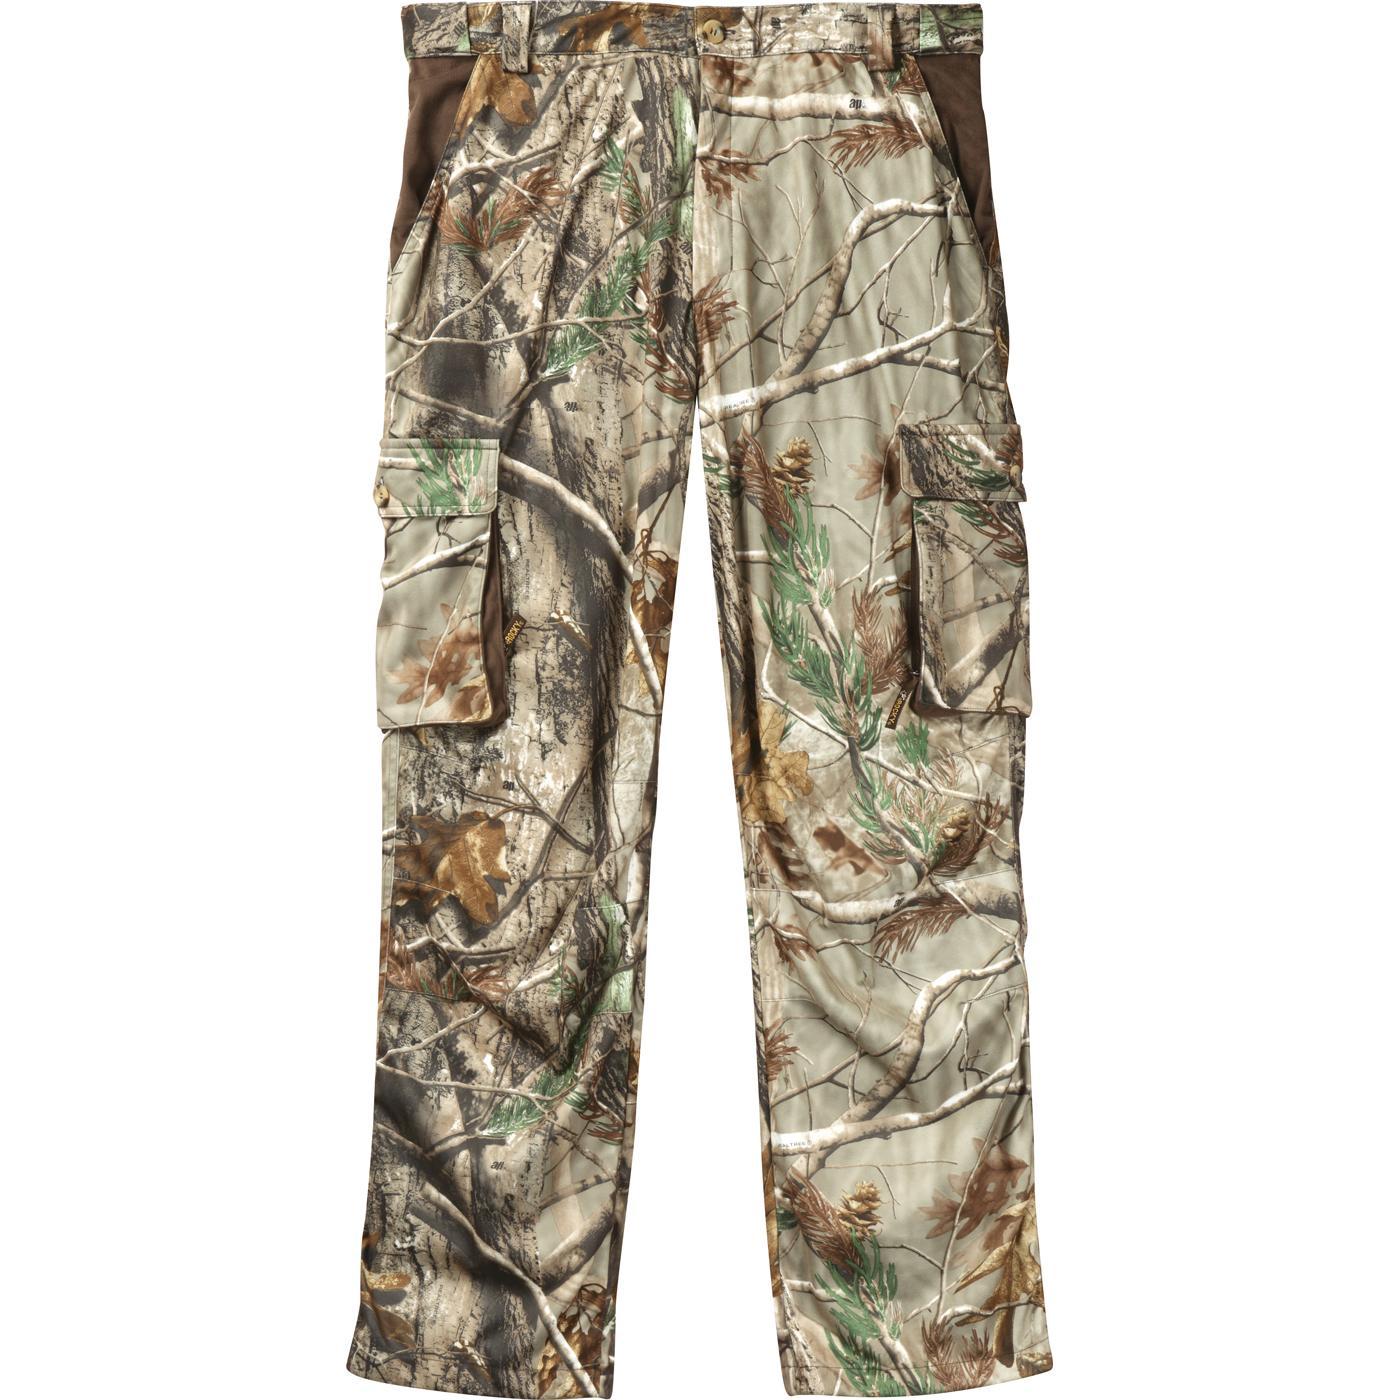 2b1ad7bdf4729 Men's Camouflage Cargo Pants - Rocky SilentHunter#600555